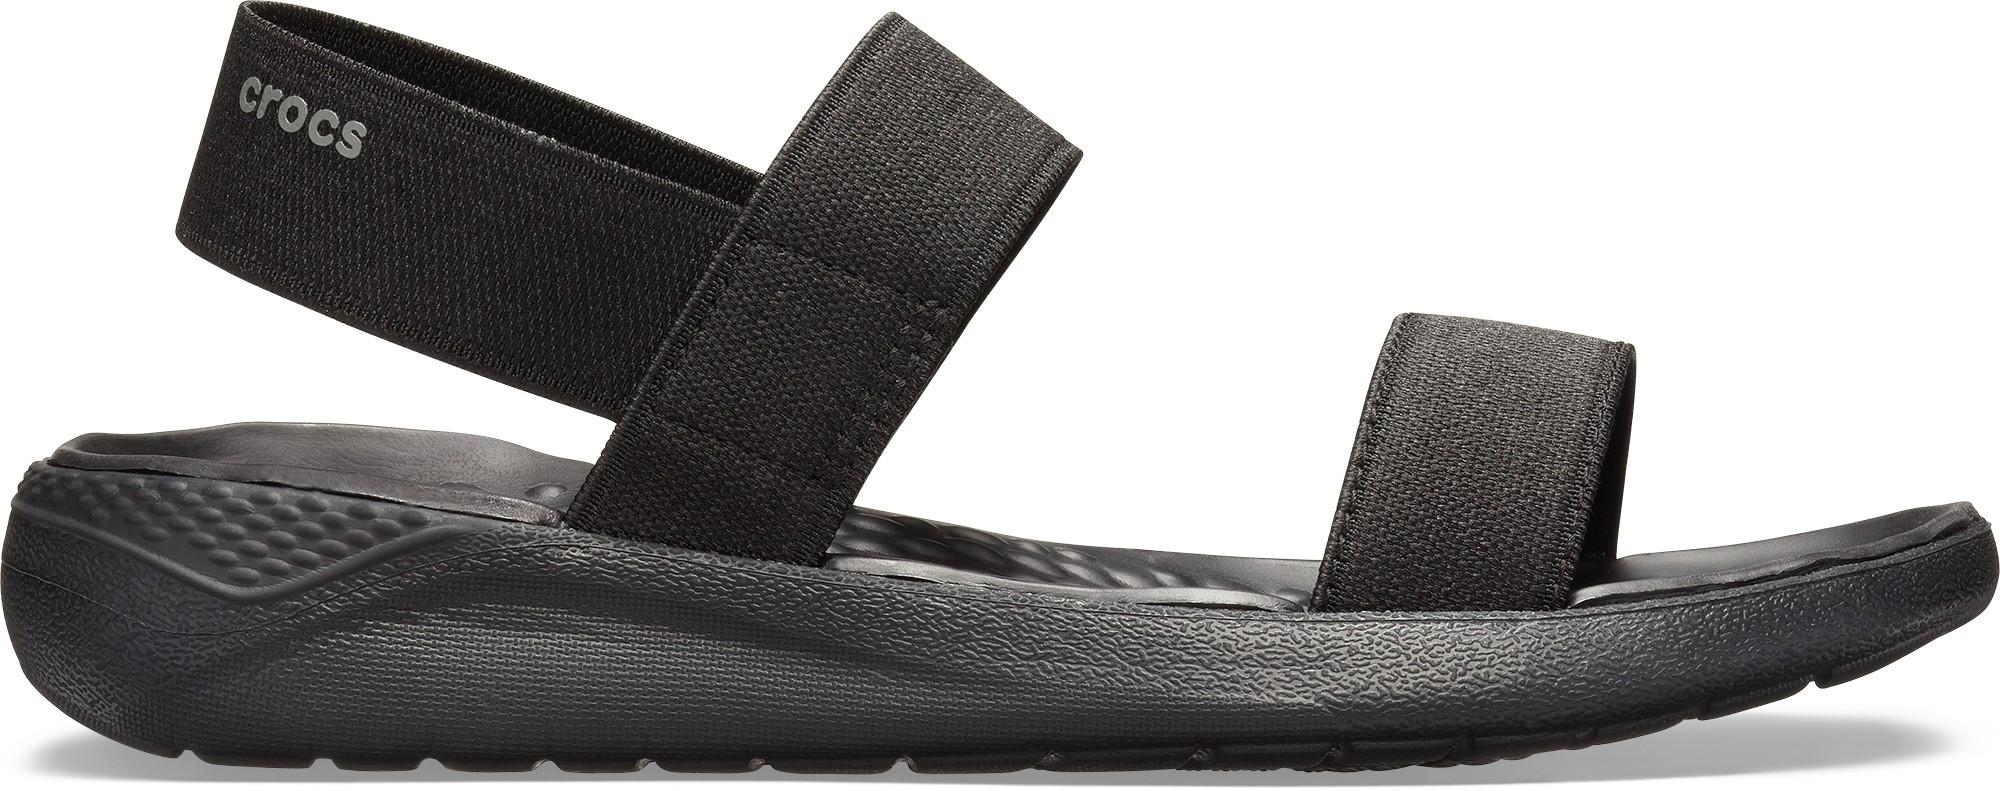 Crocs™ Women's LiteRide Sandal Black/Black 35